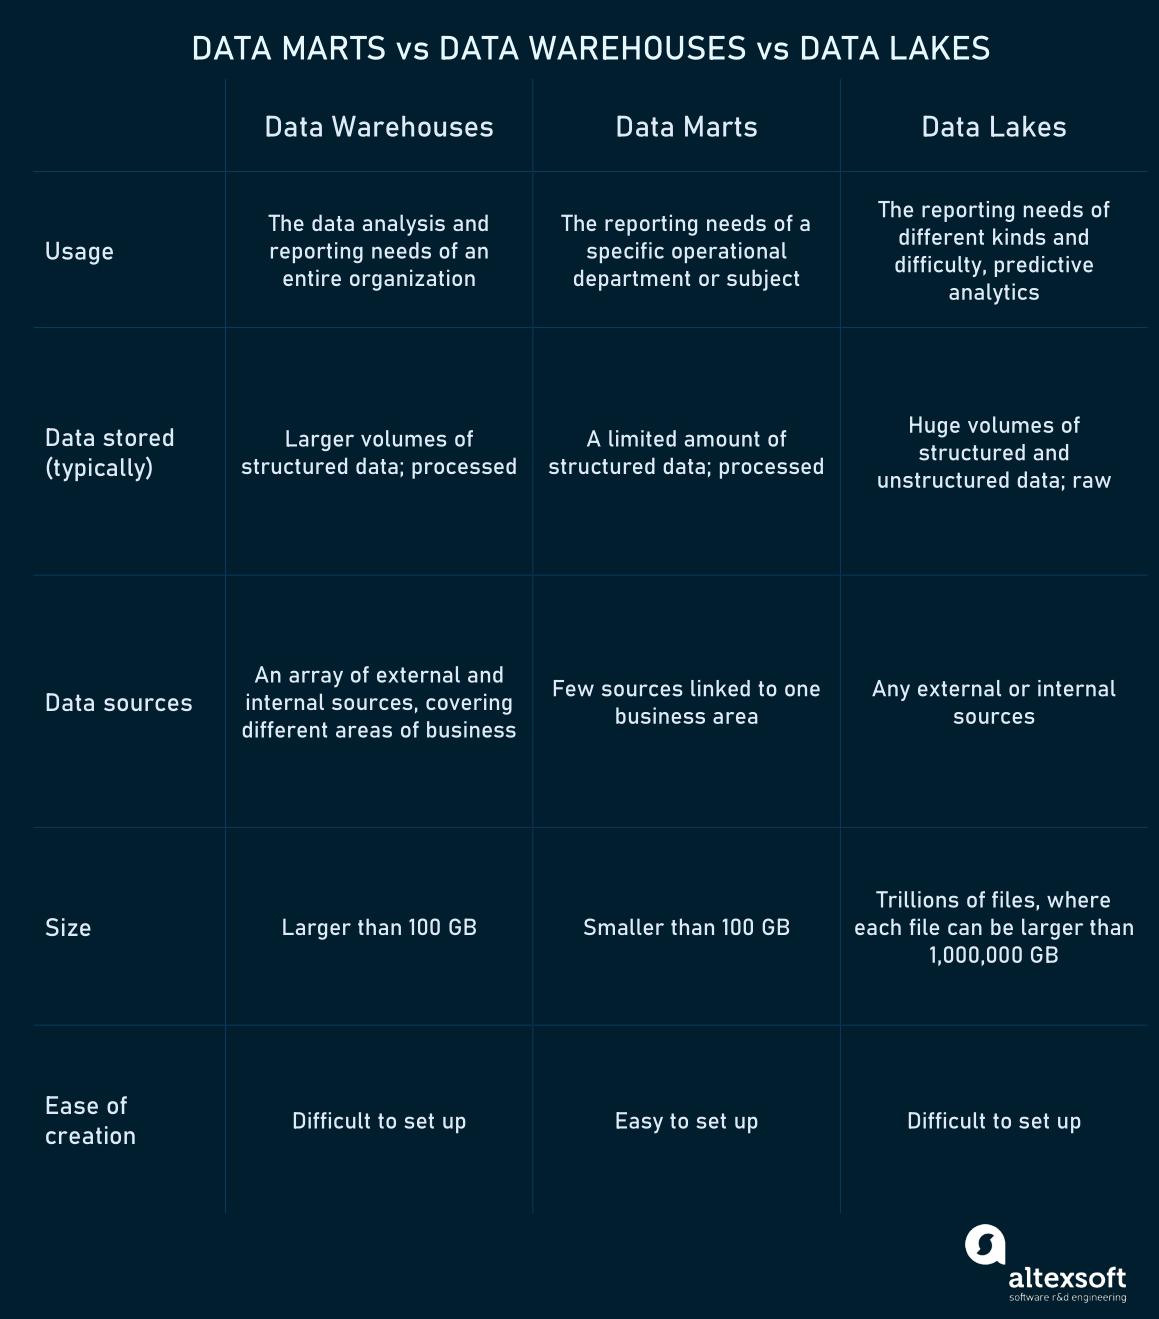 Key differences between data marts, data warehouses, and data lakes